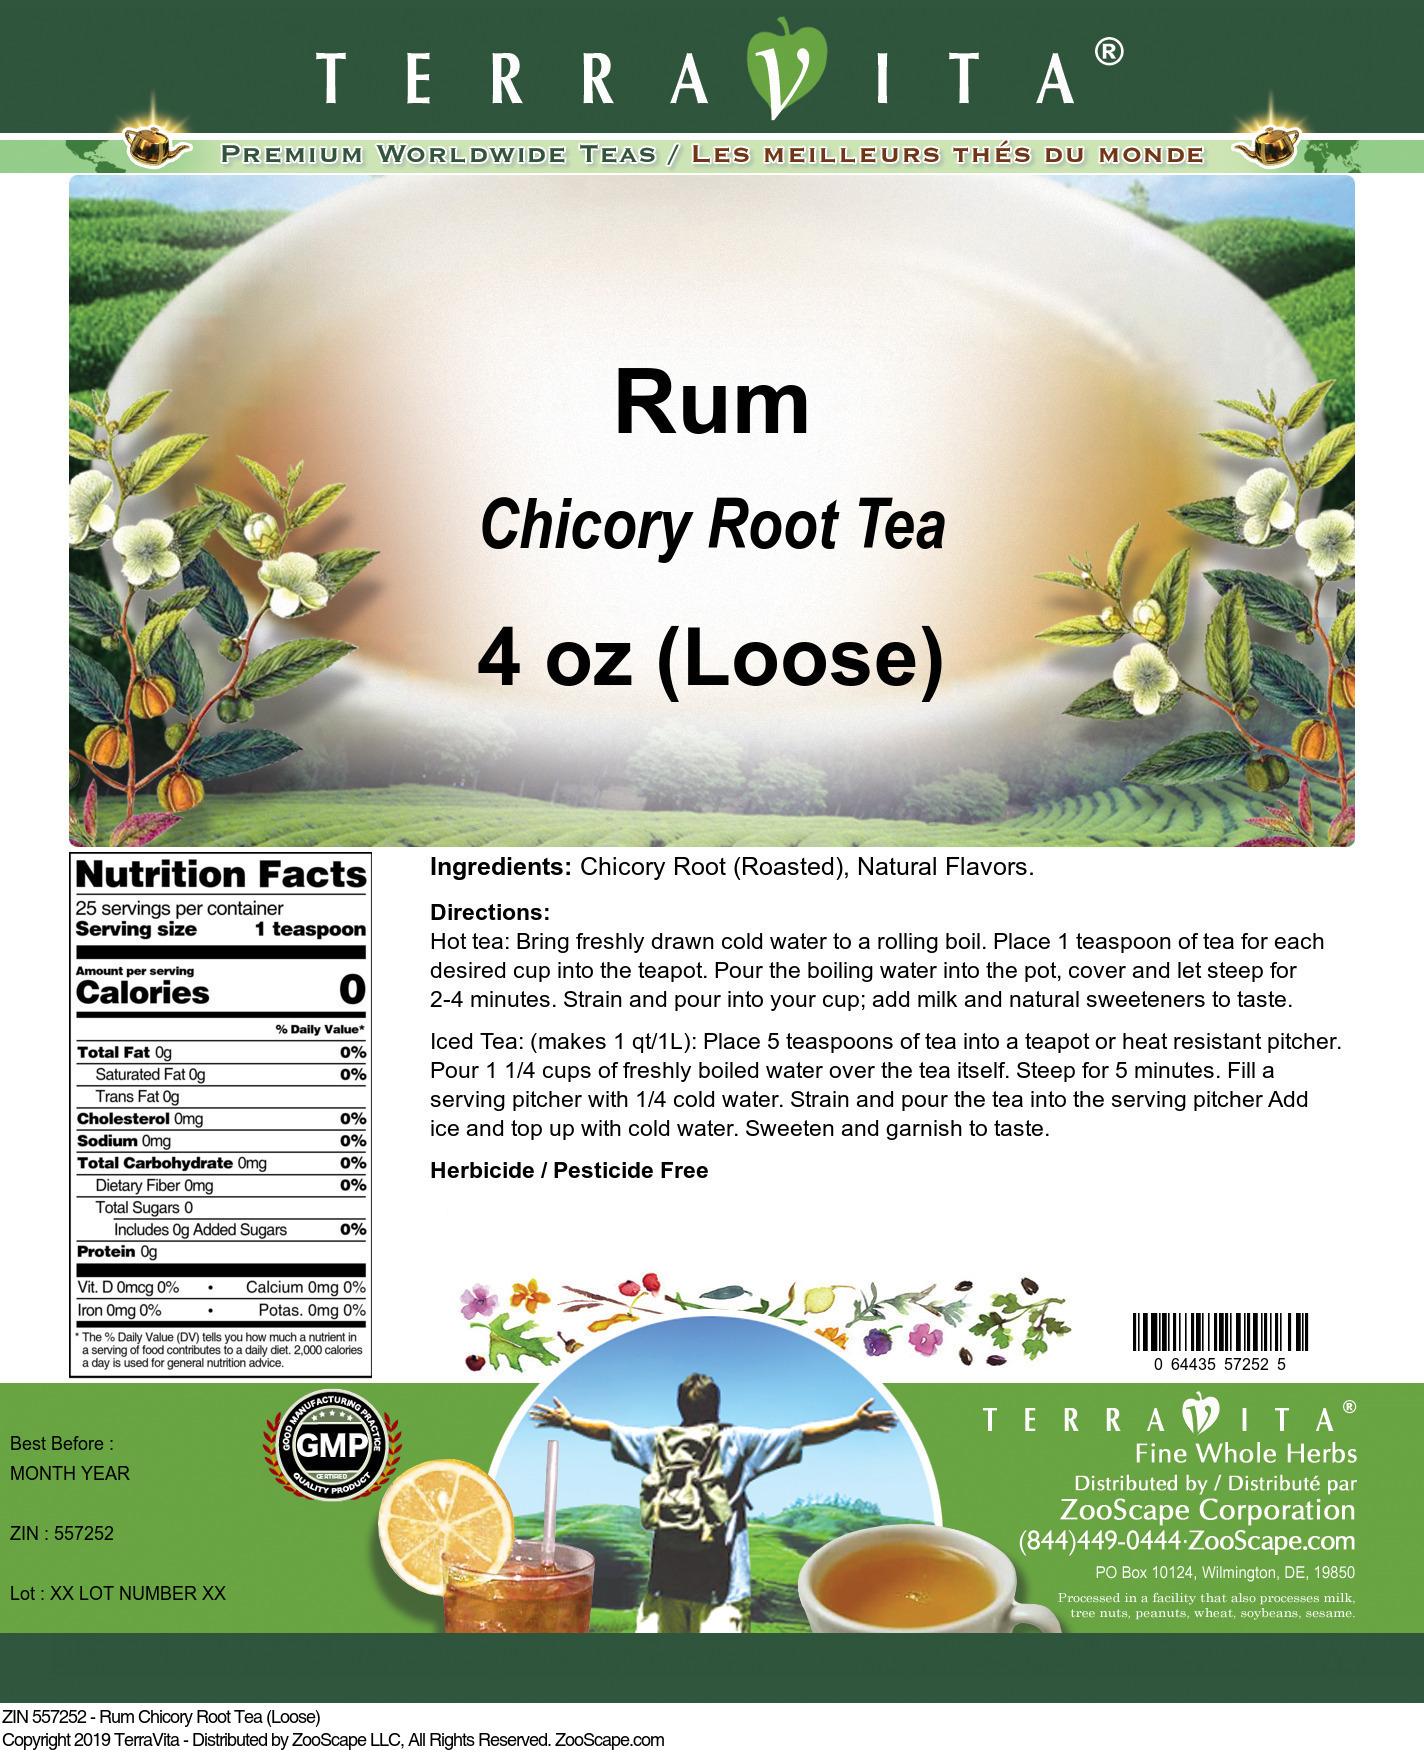 Rum Chicory Root Tea (Loose)